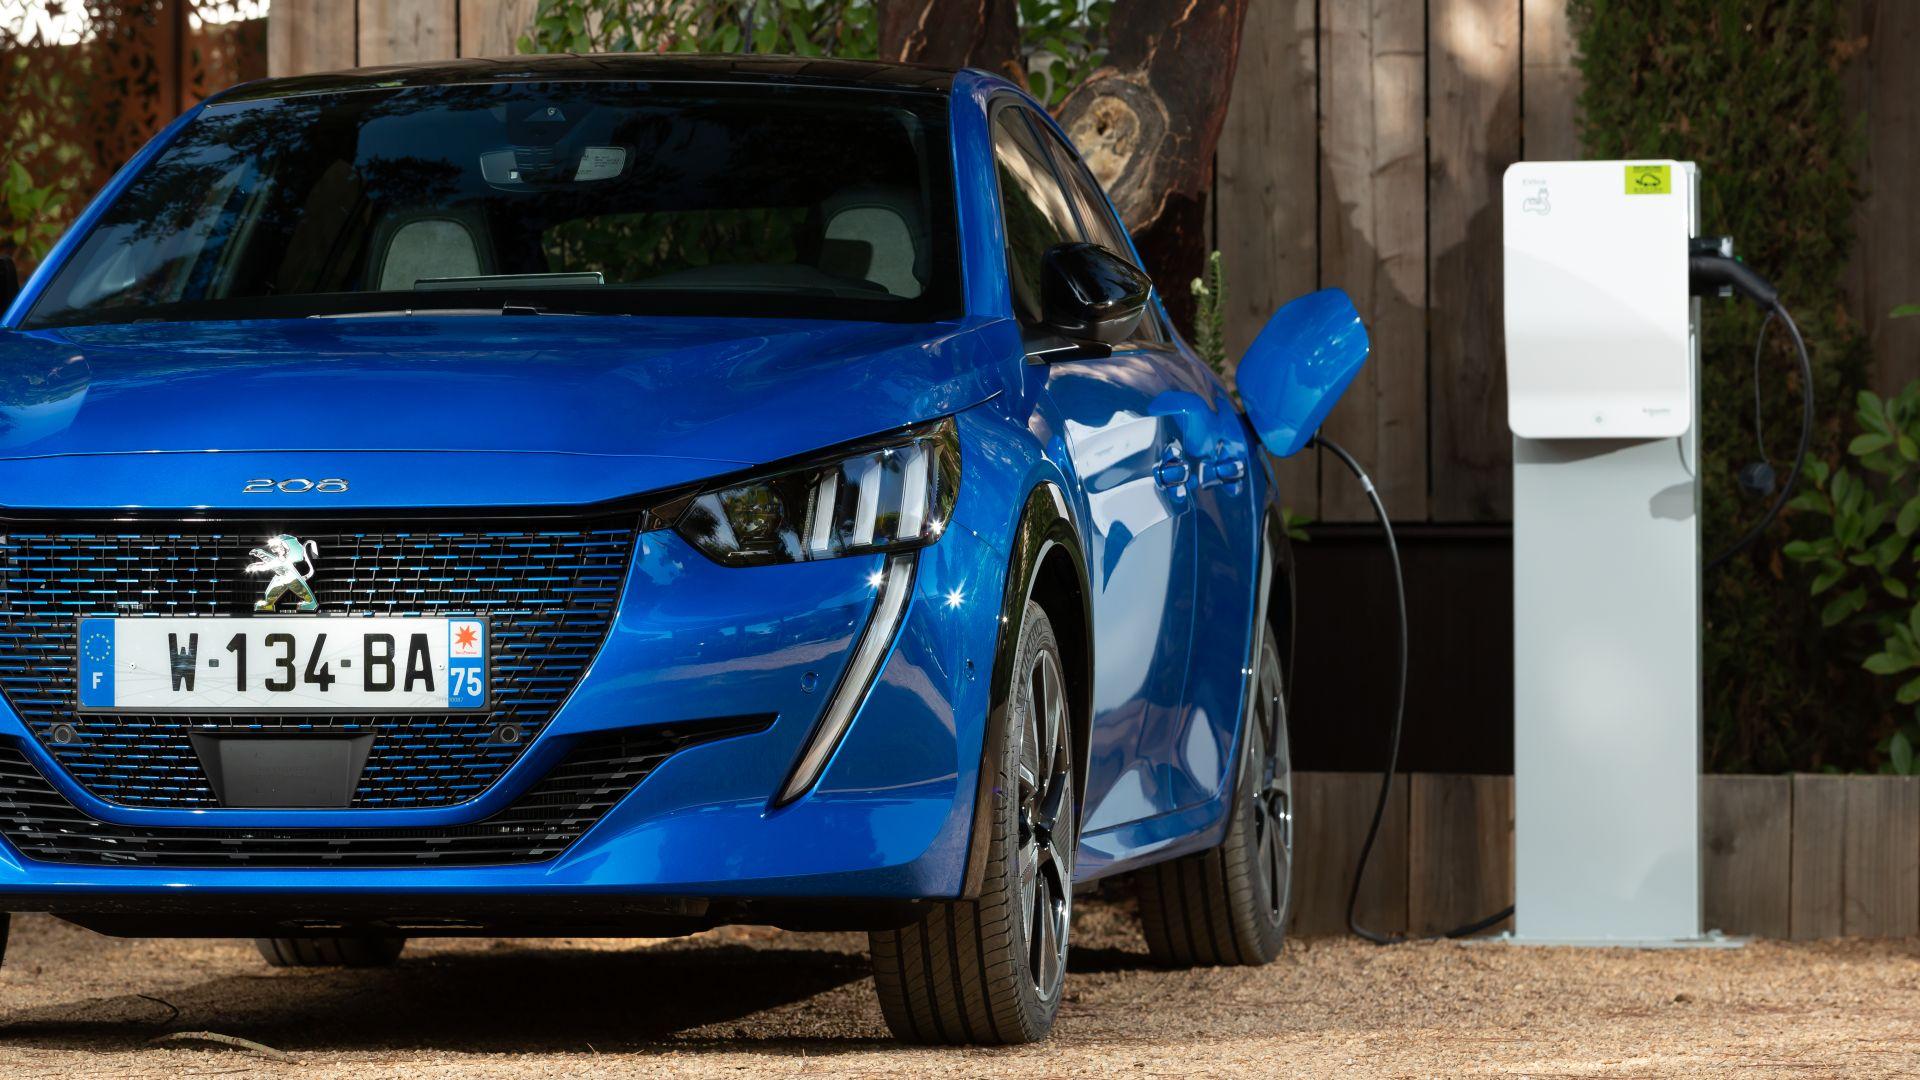 España se convertirá en el tercer país de Europa en fabricación de vehículos electrificados